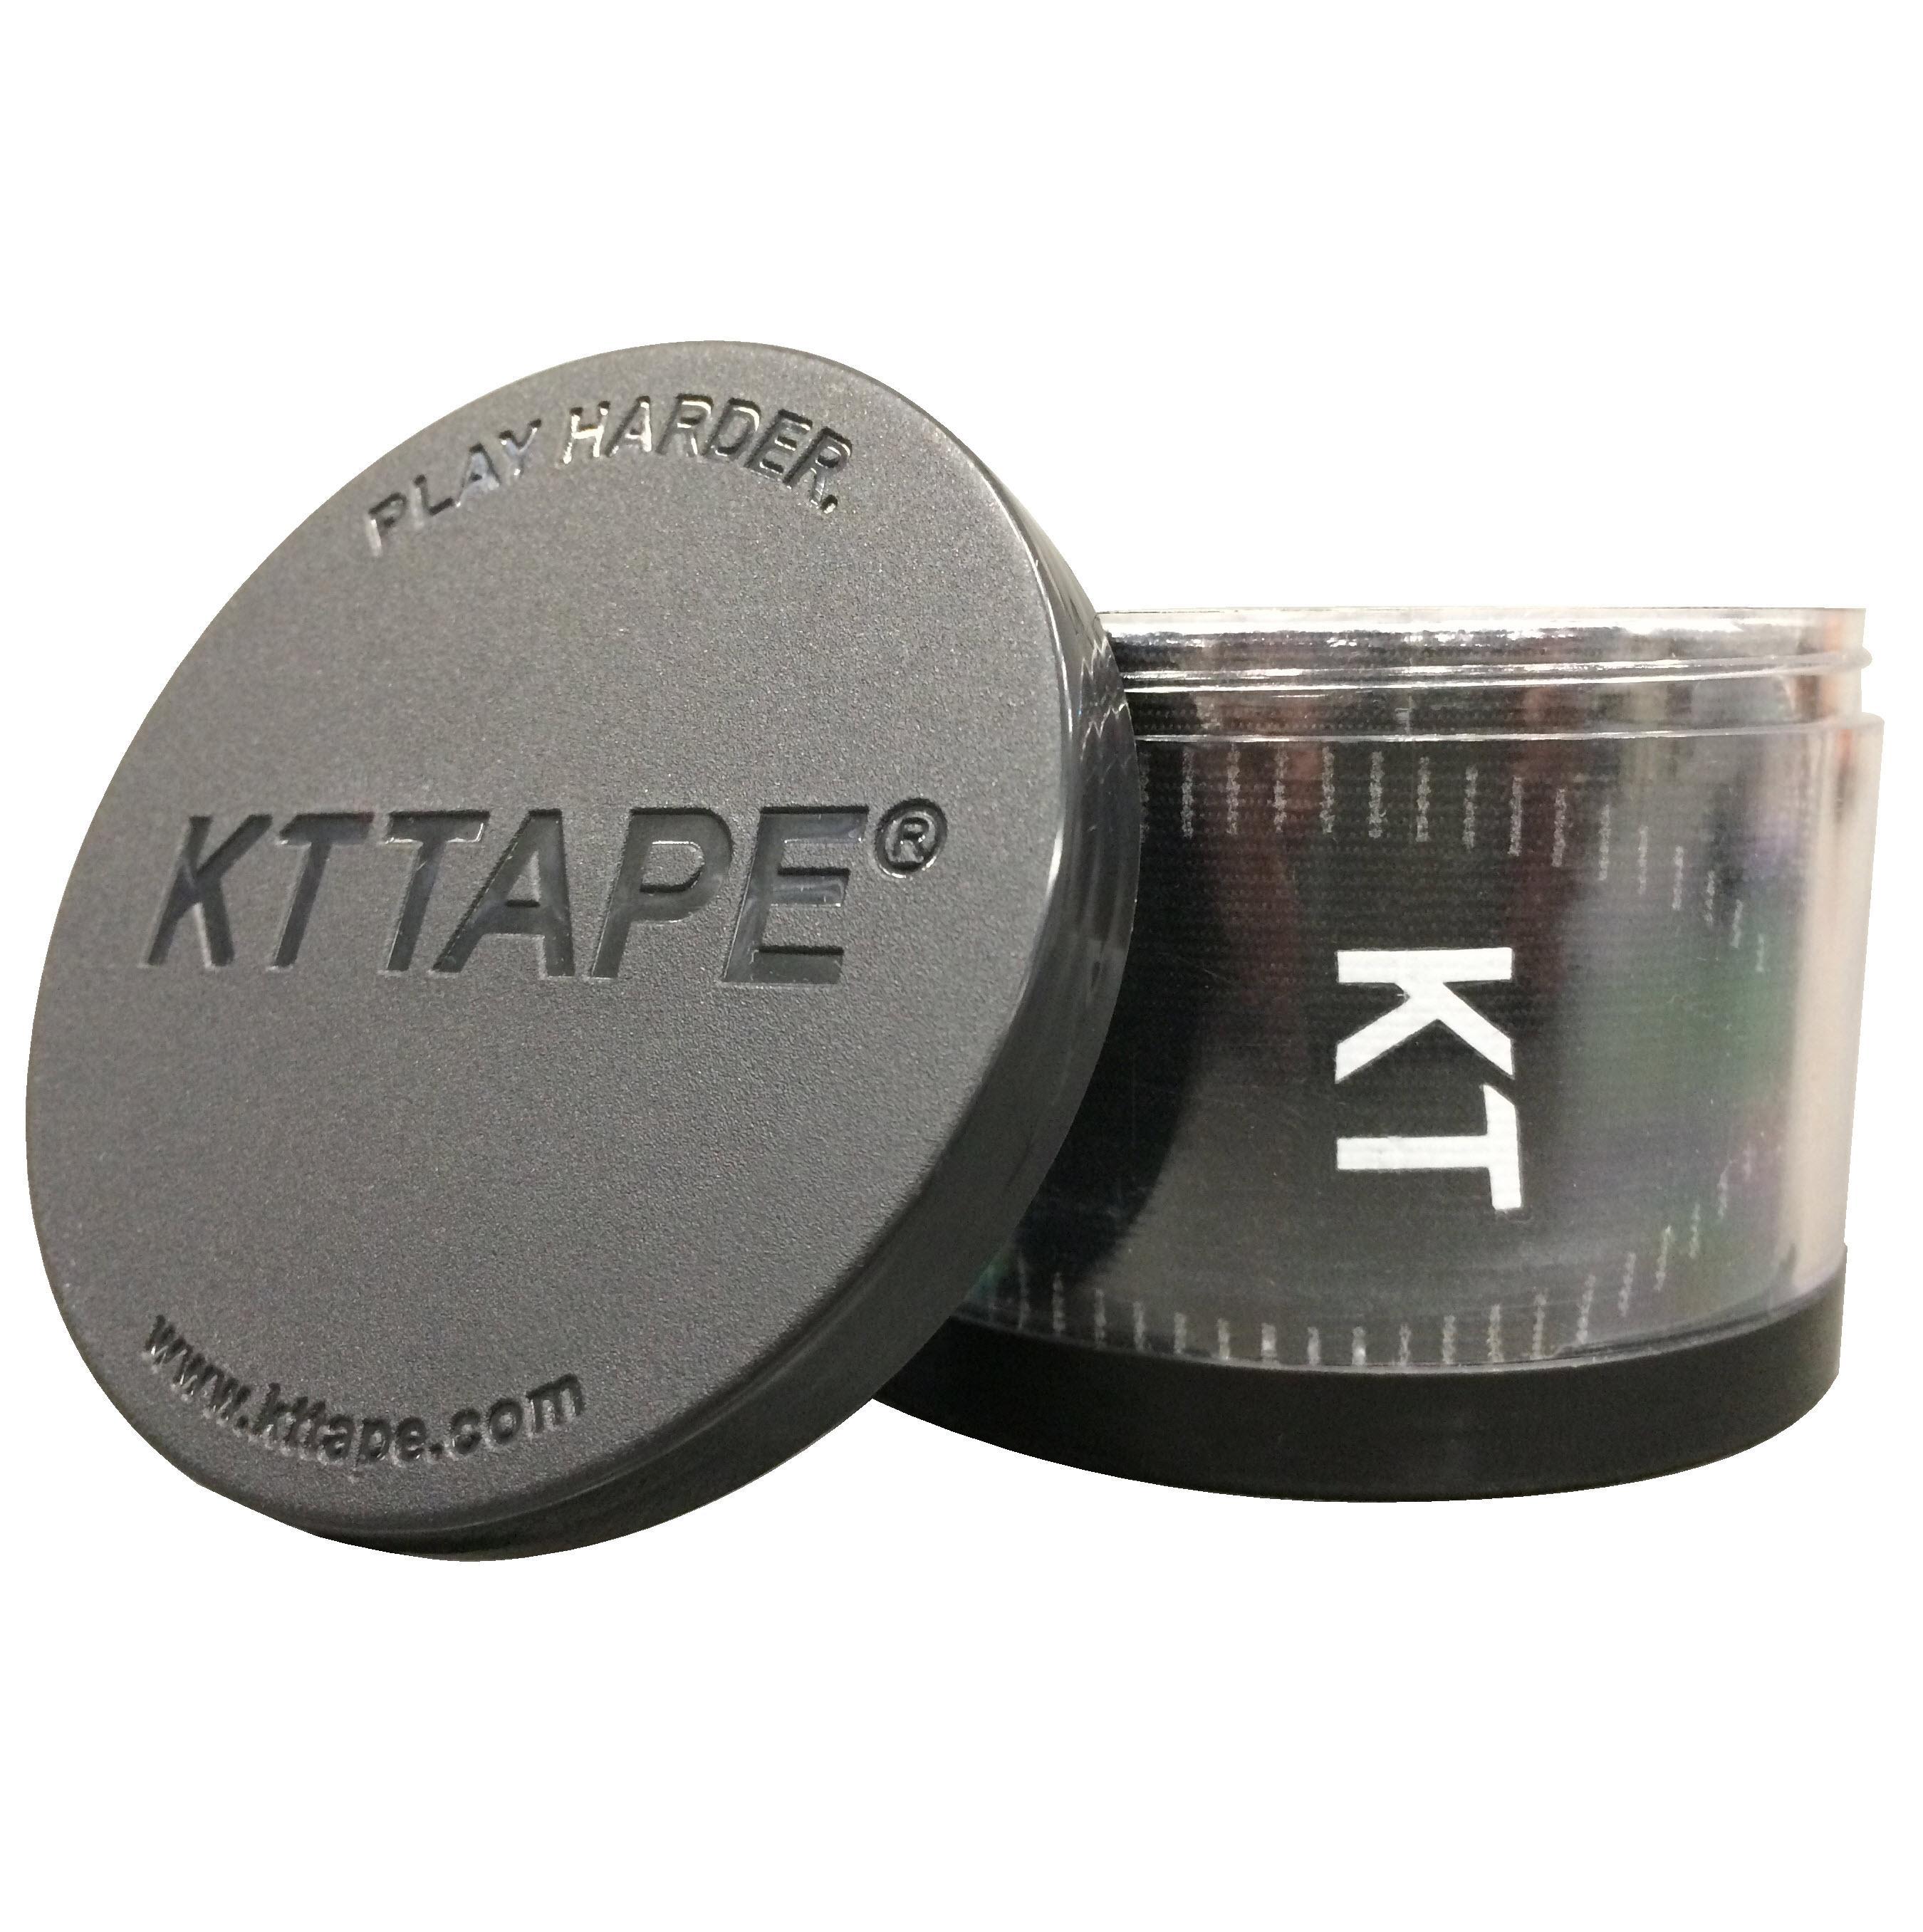 kt tape pro instructions